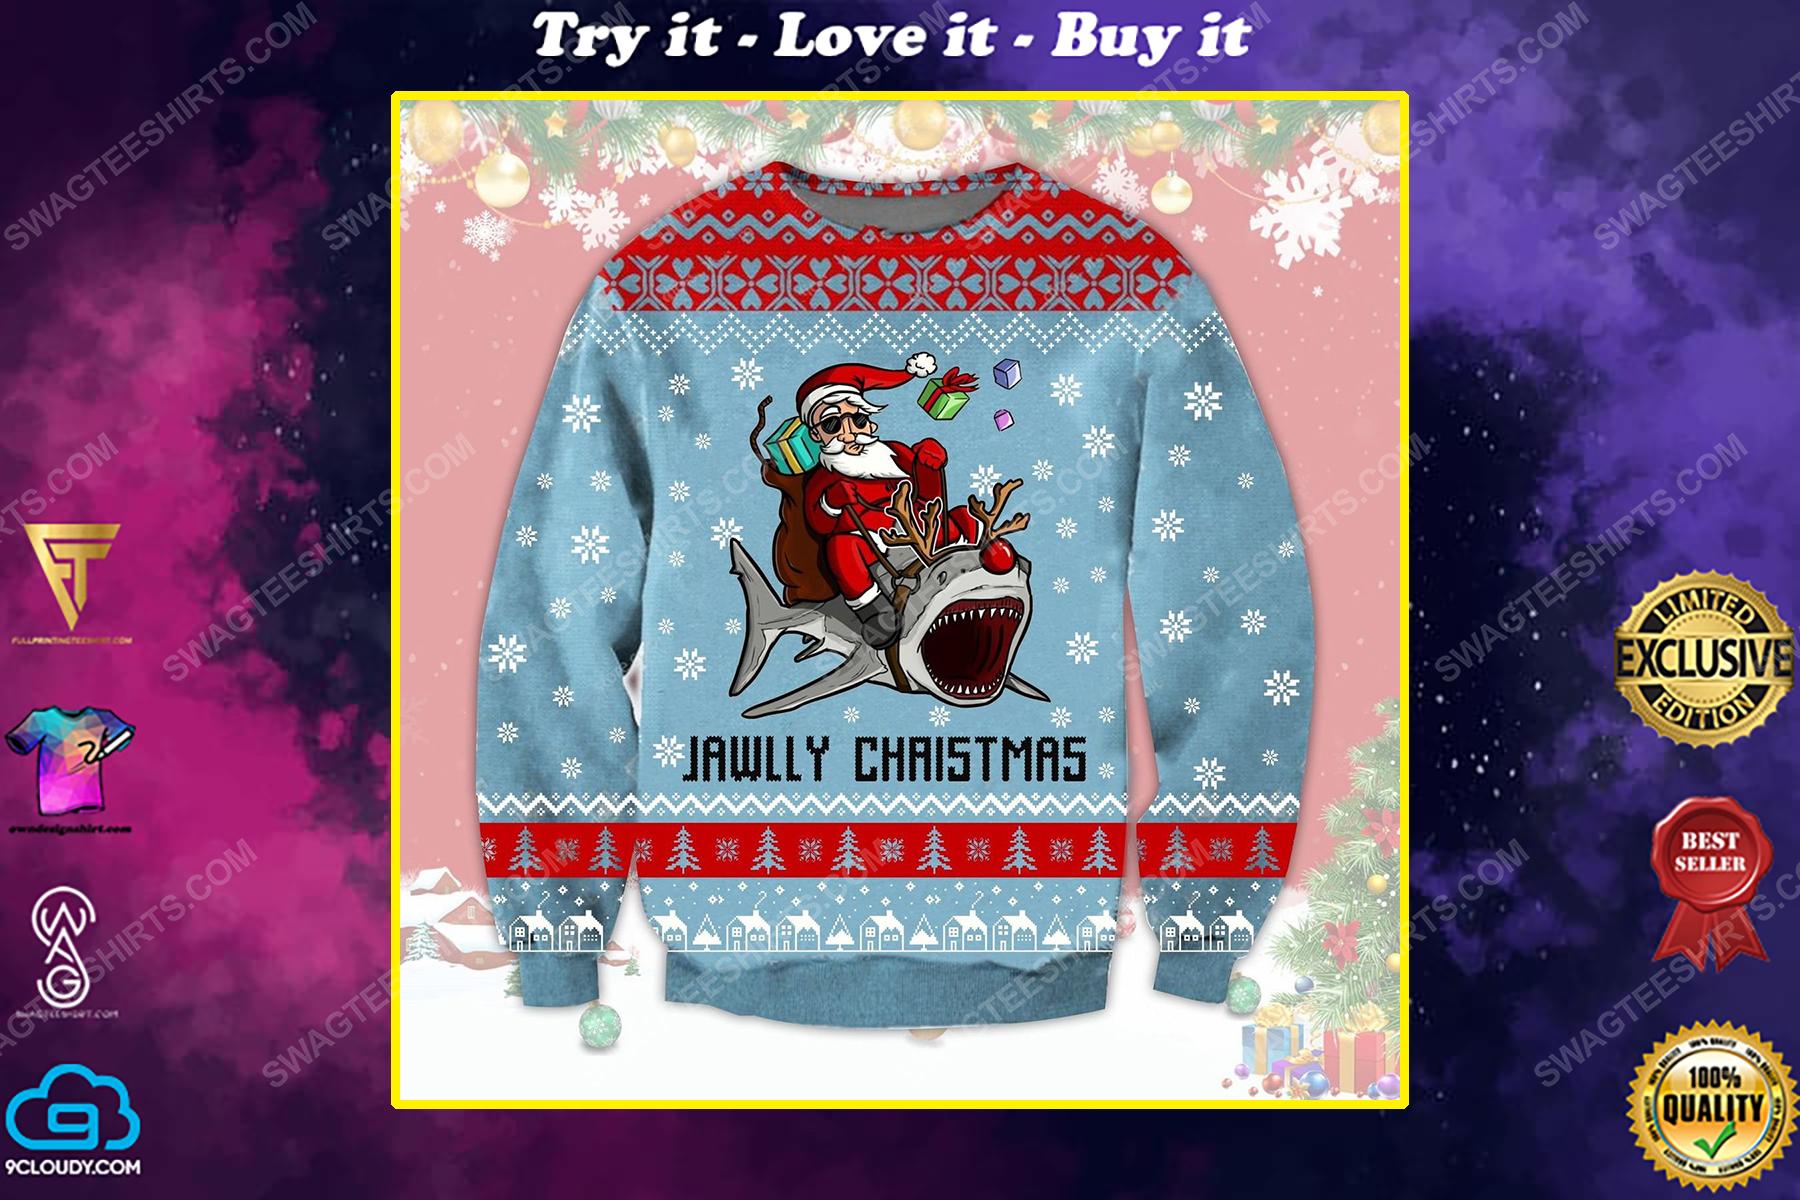 Santa riding shark jawlly christmas ugly christmas sweater 1